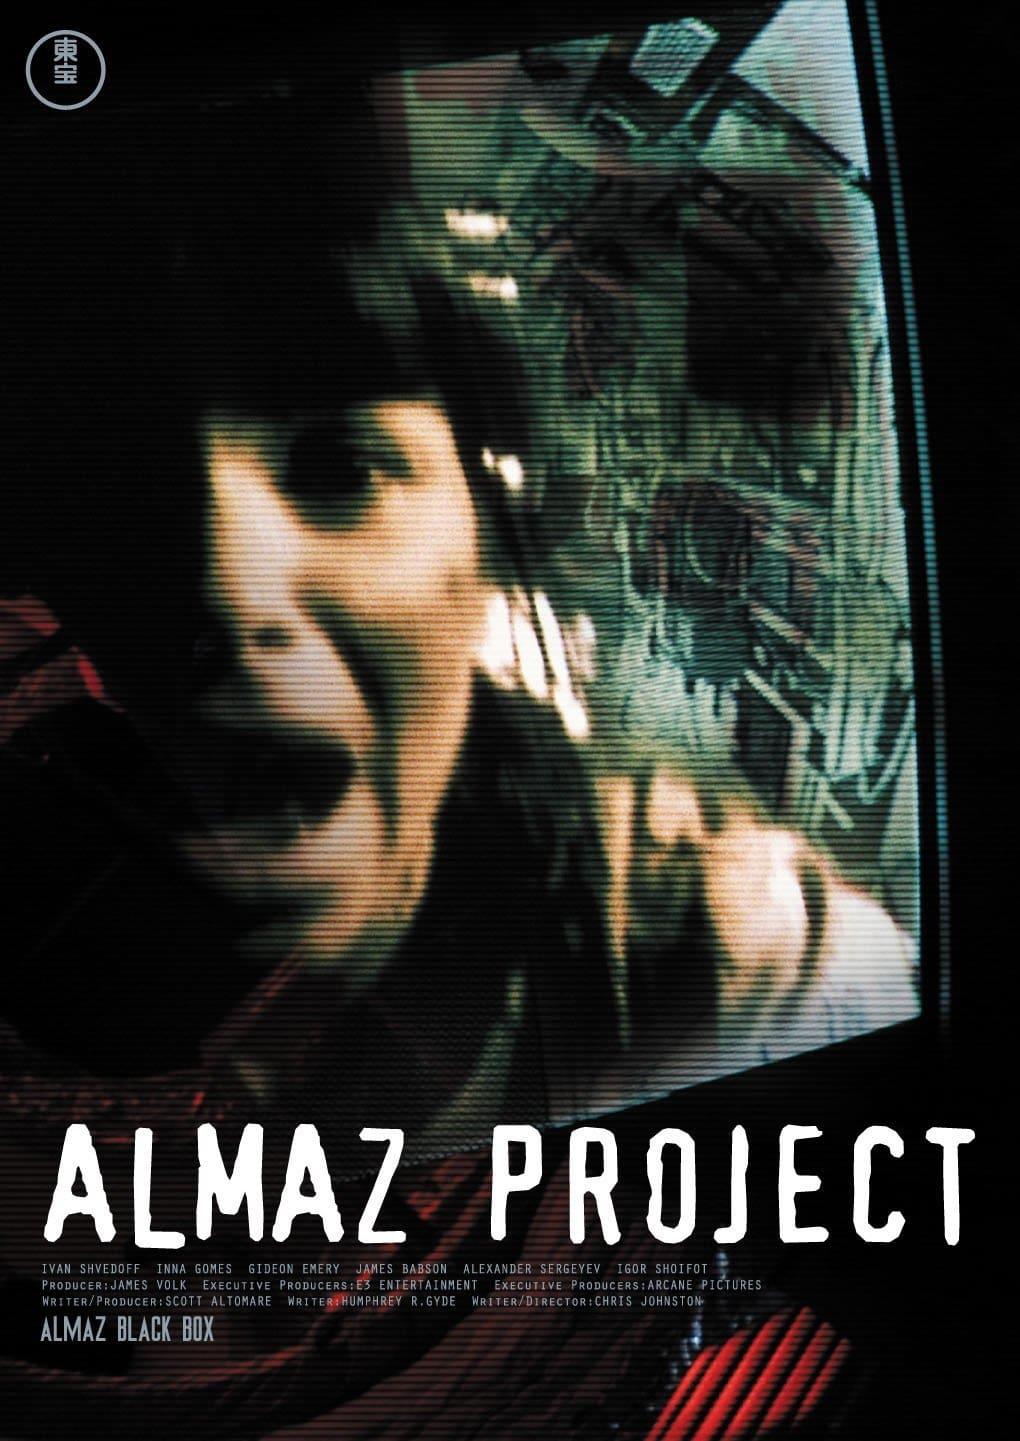 Almaz Black Box